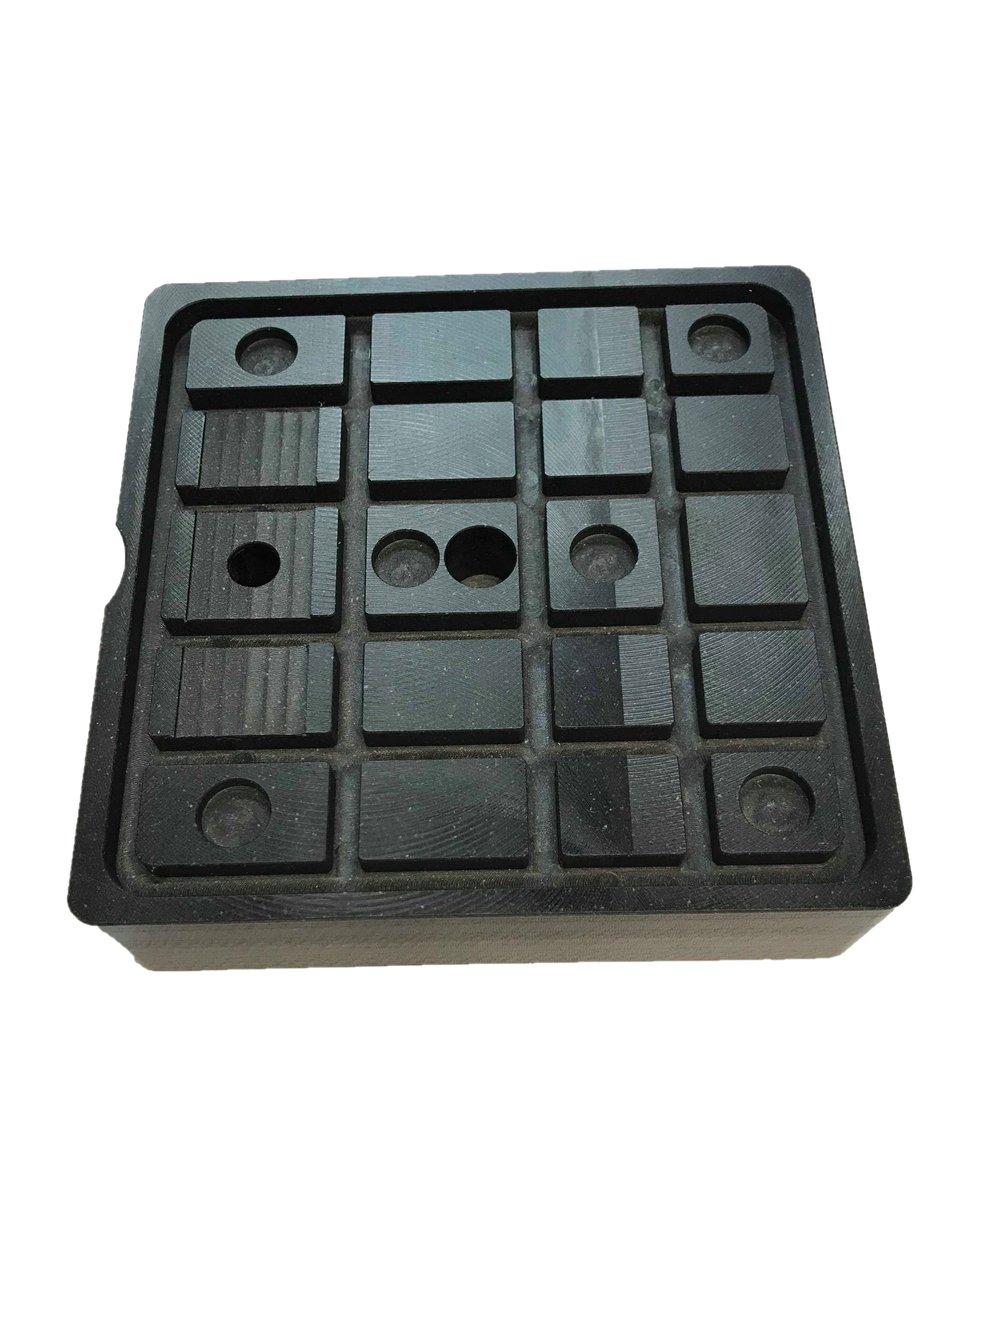 Online Store Mec Precision Repair Servo Motor Spindles Valve Service Suction Pads For Homag